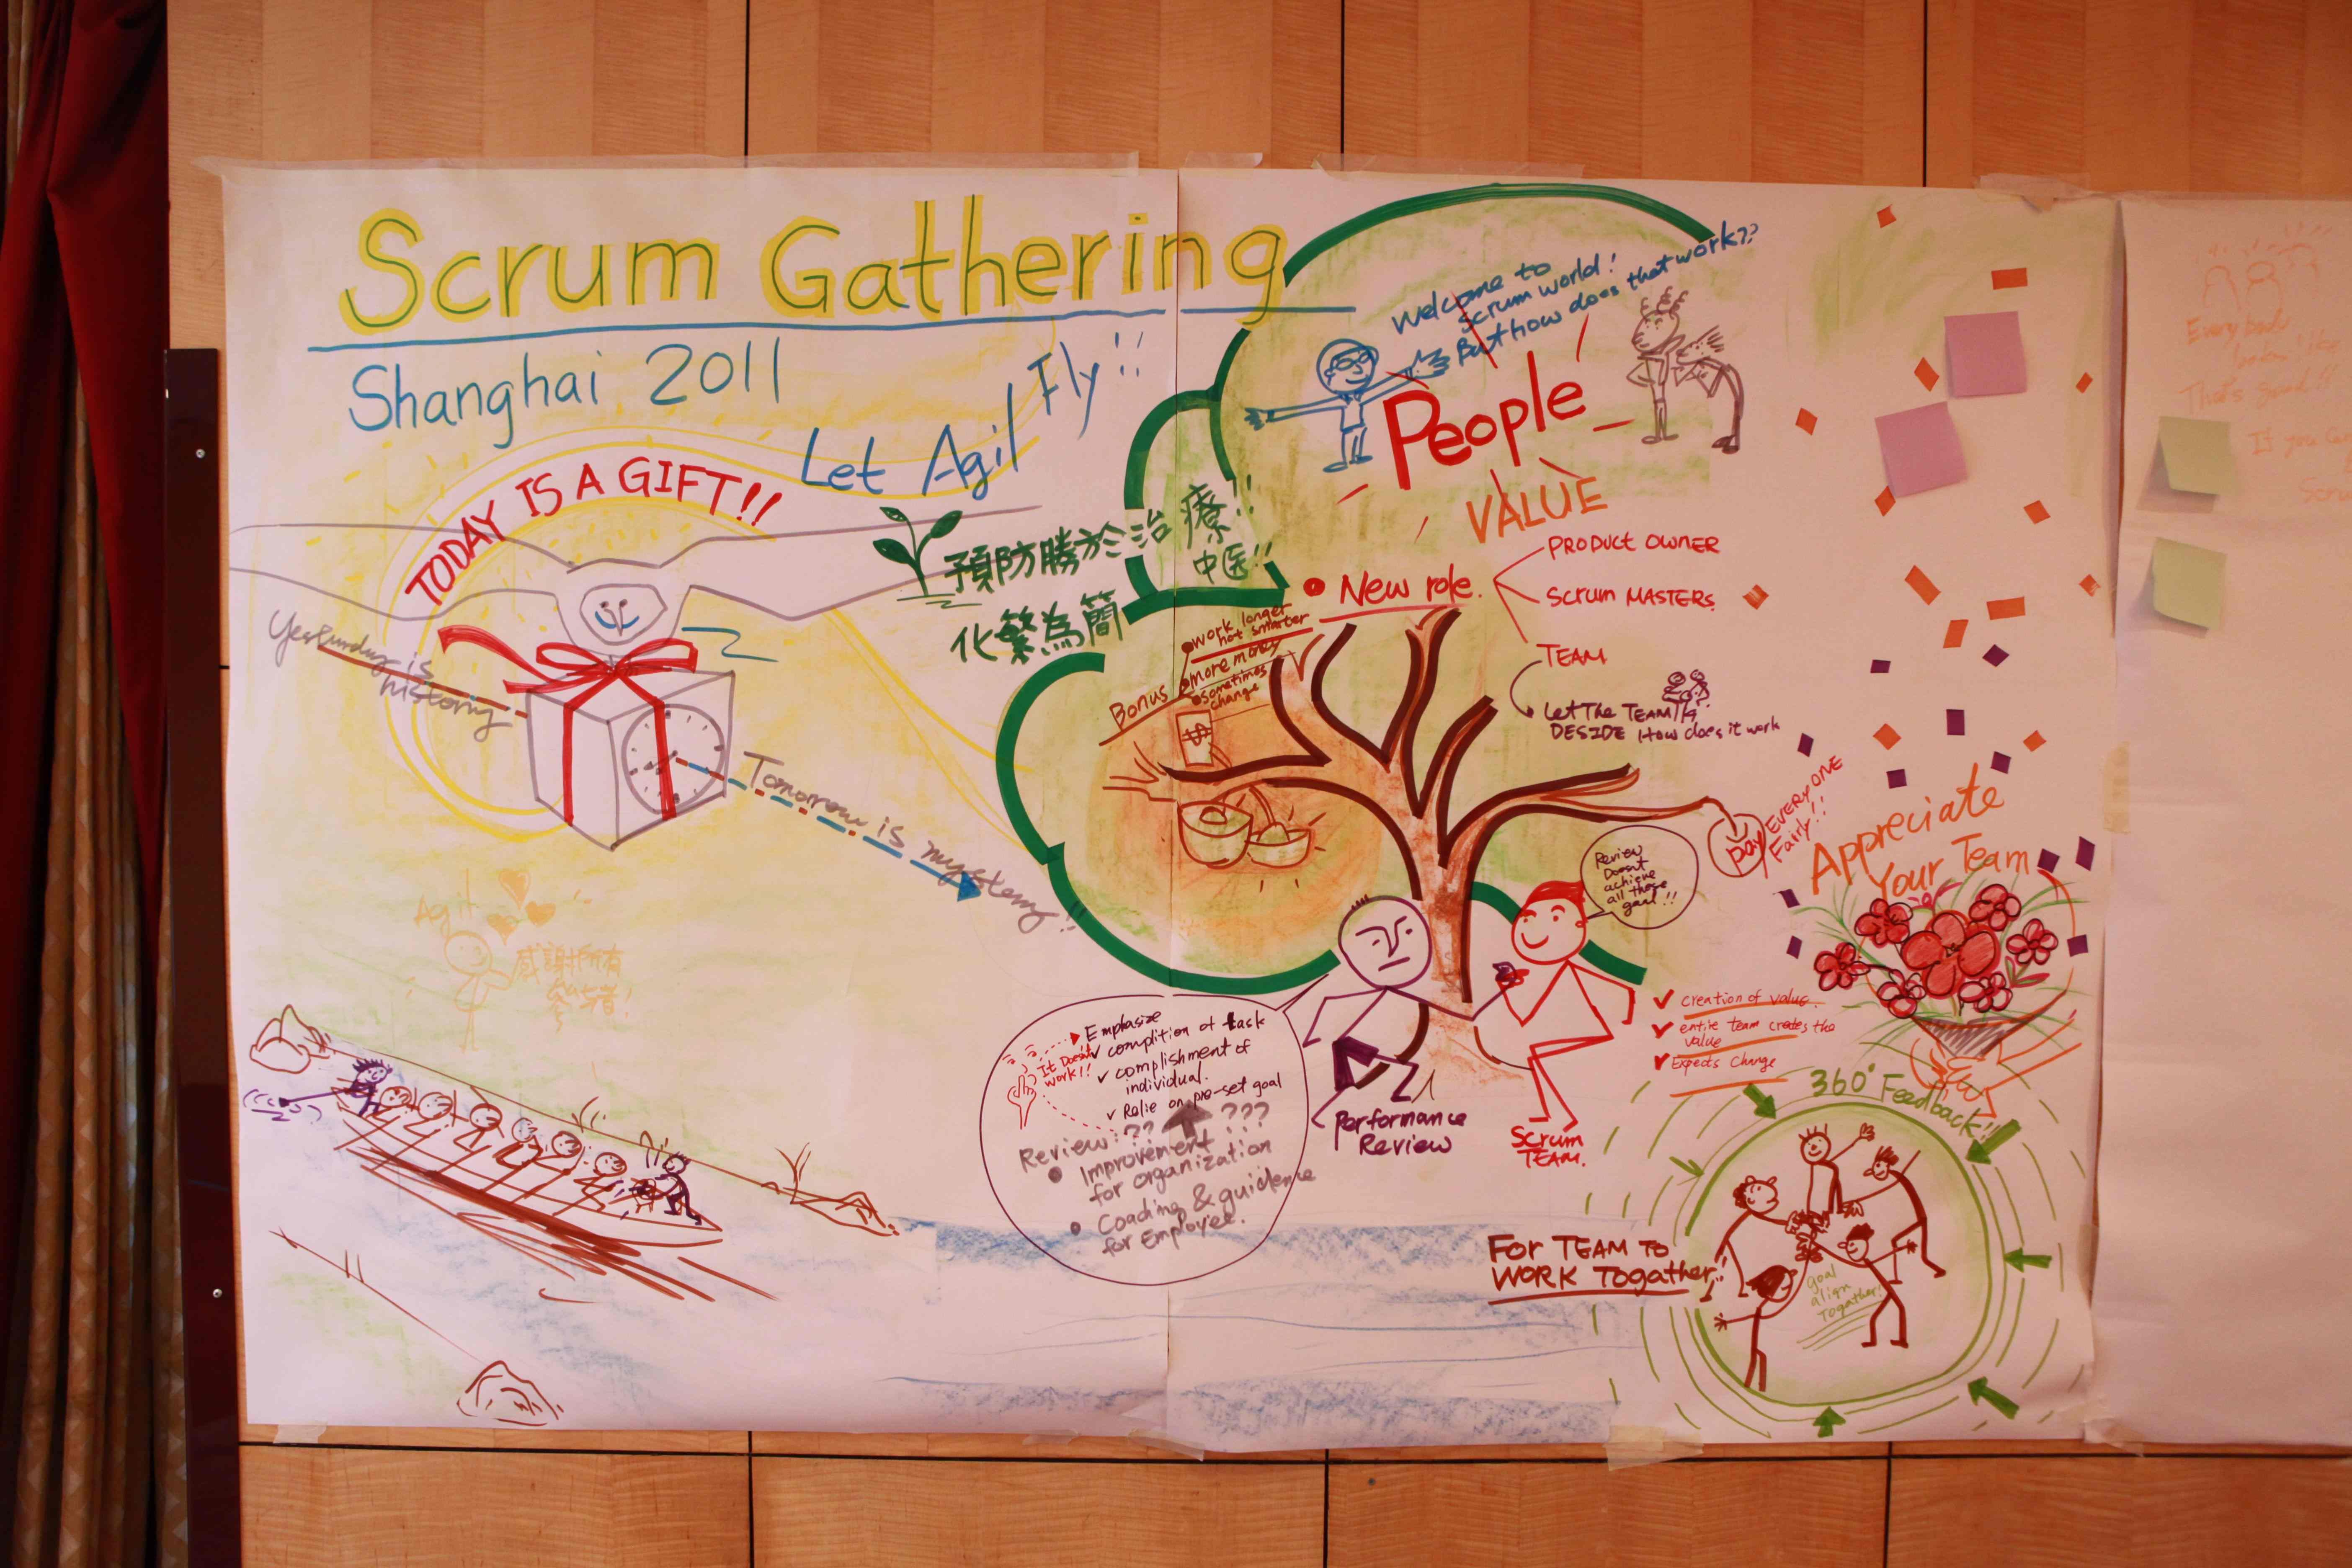 Scrum Gathering 2011